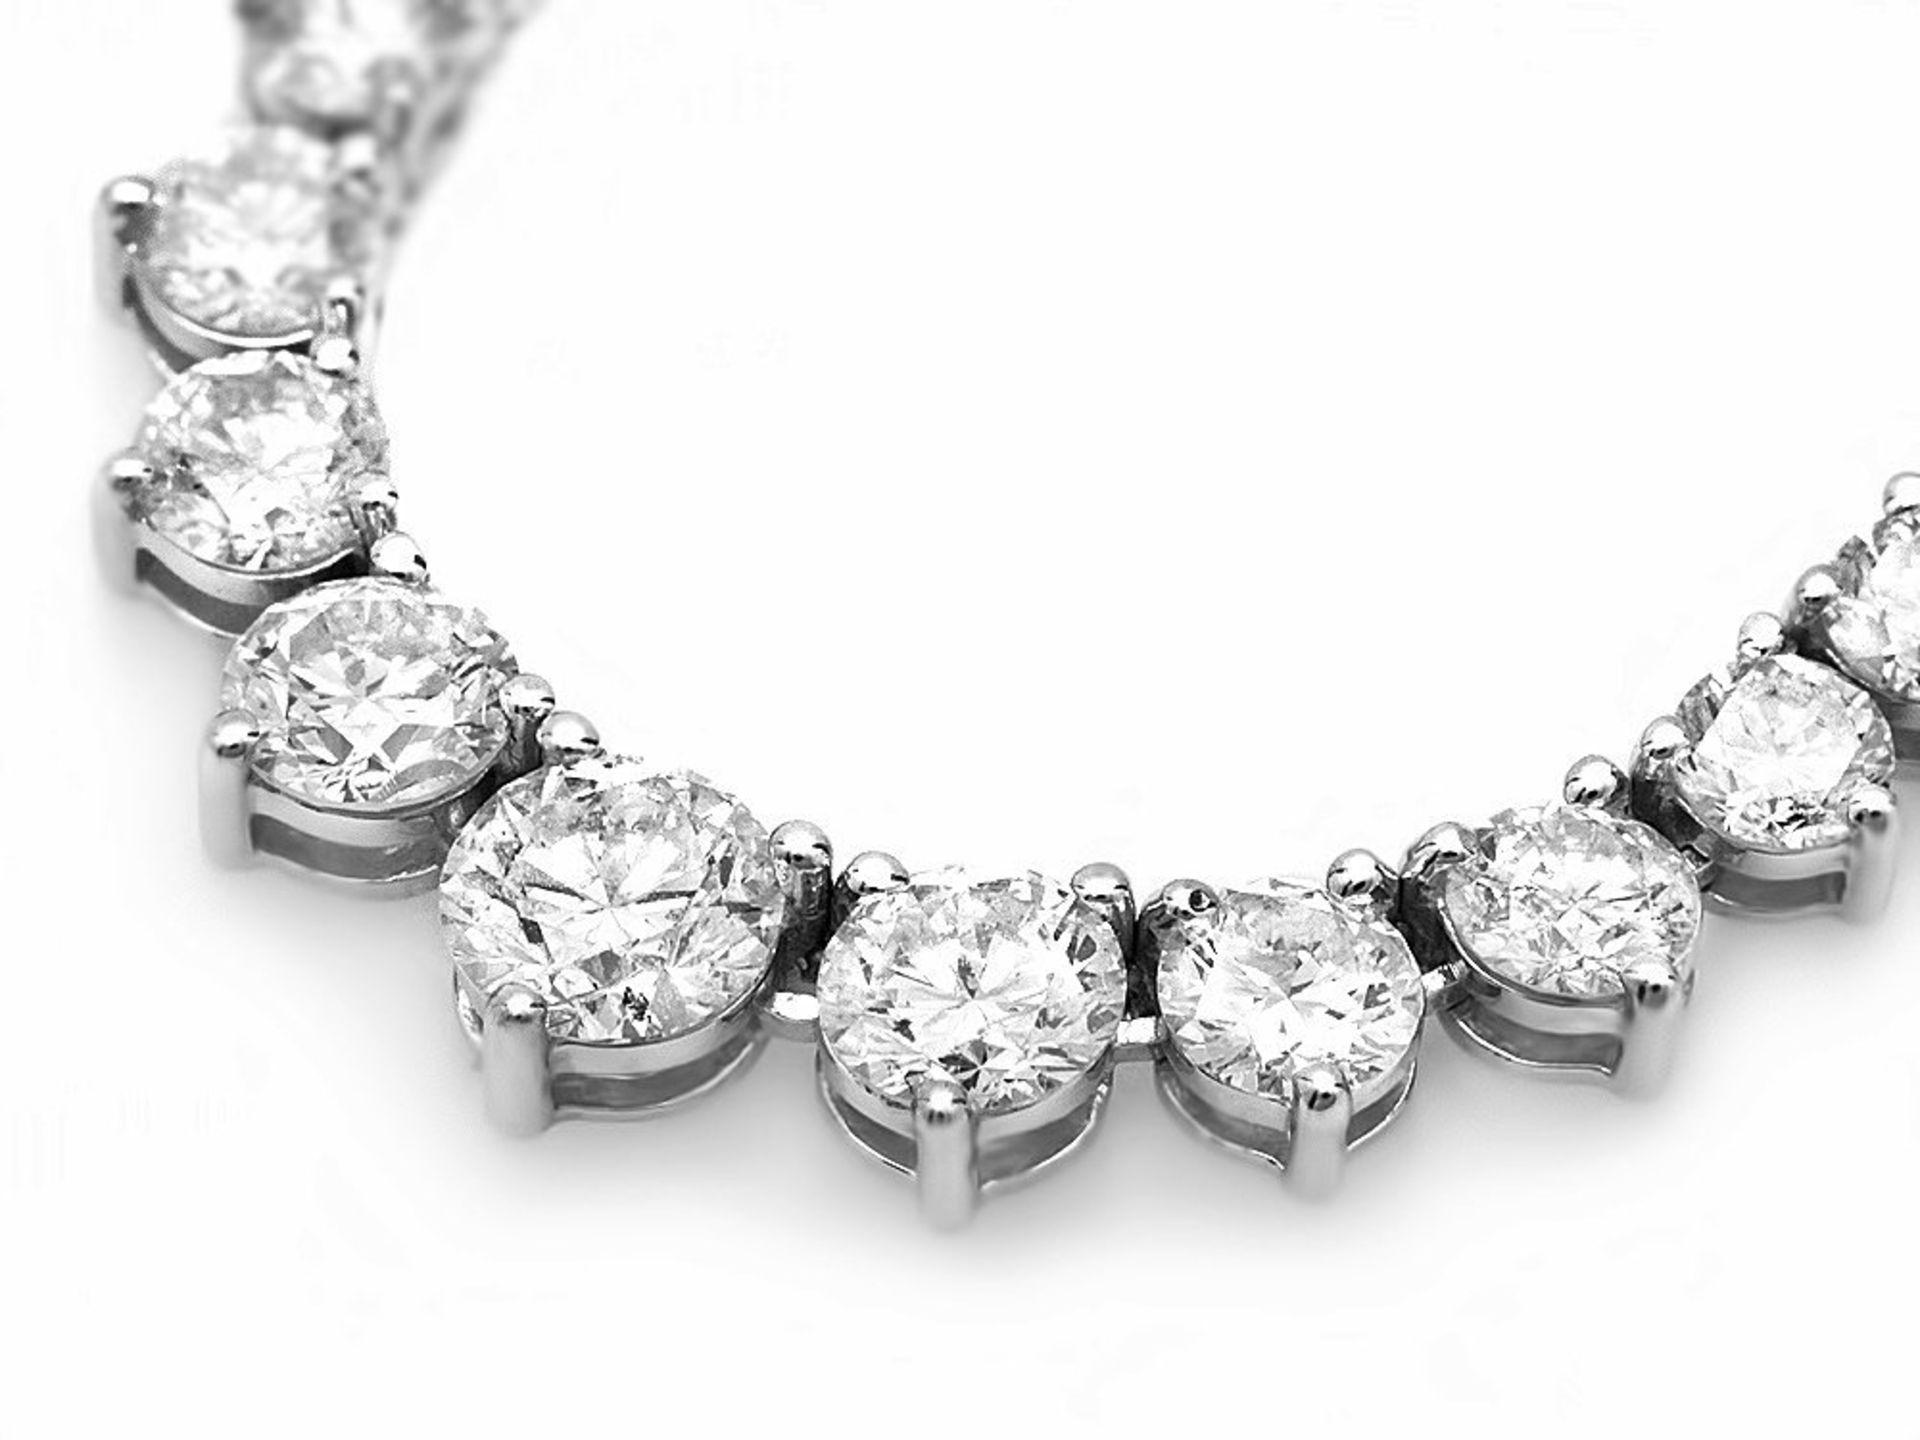 18k White Gold 12.00ct Diamond Necklace - Image 2 of 5